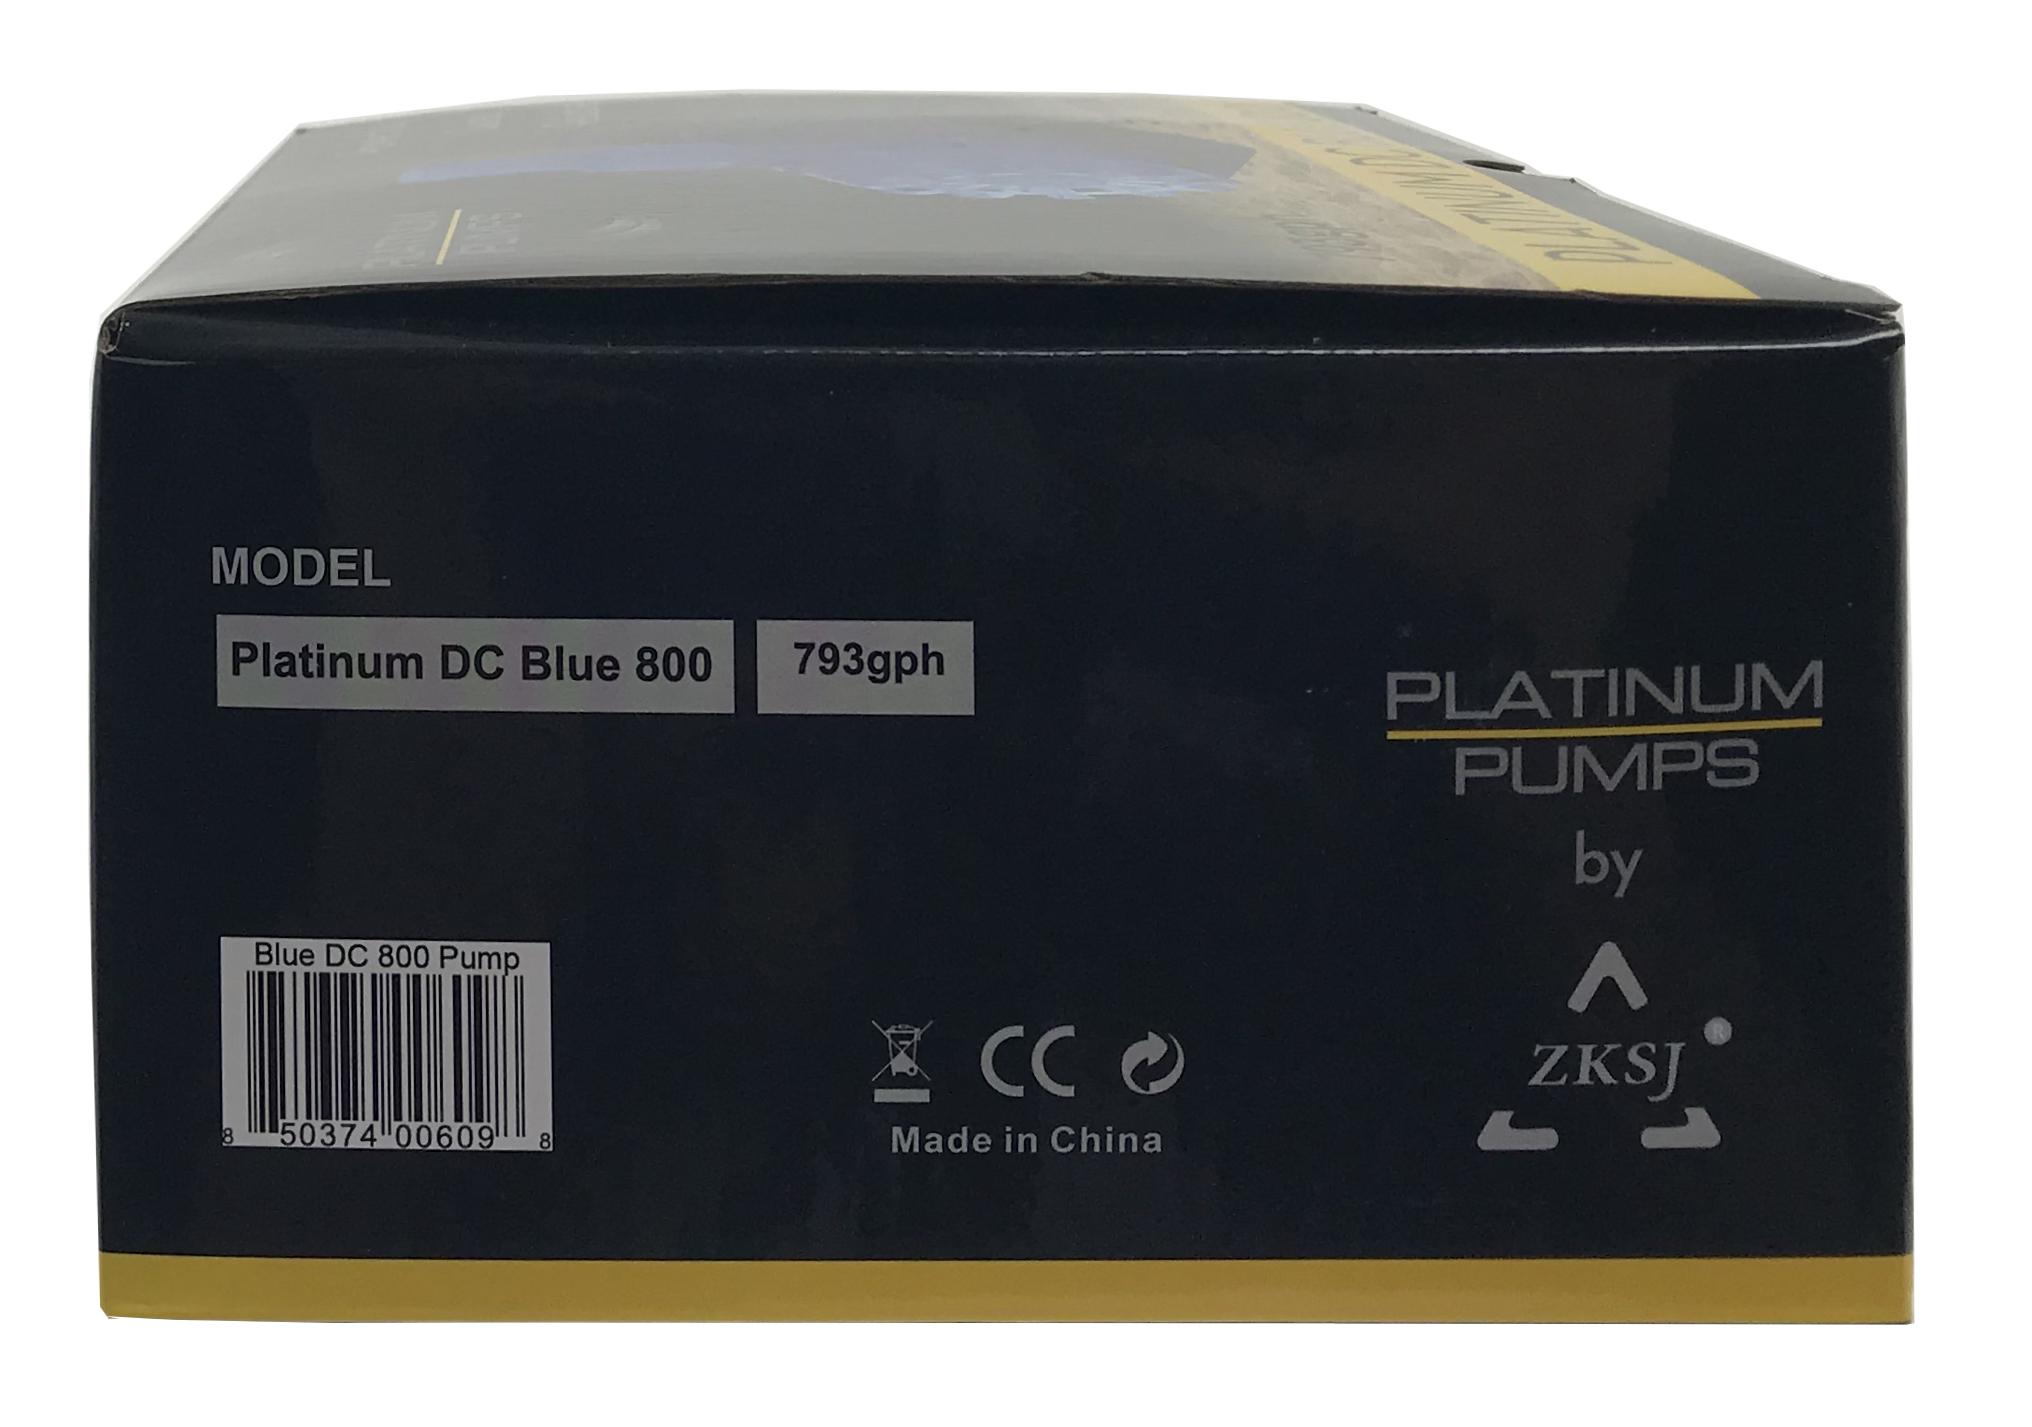 Platinum DC Blue 800 Pump - 793 gph